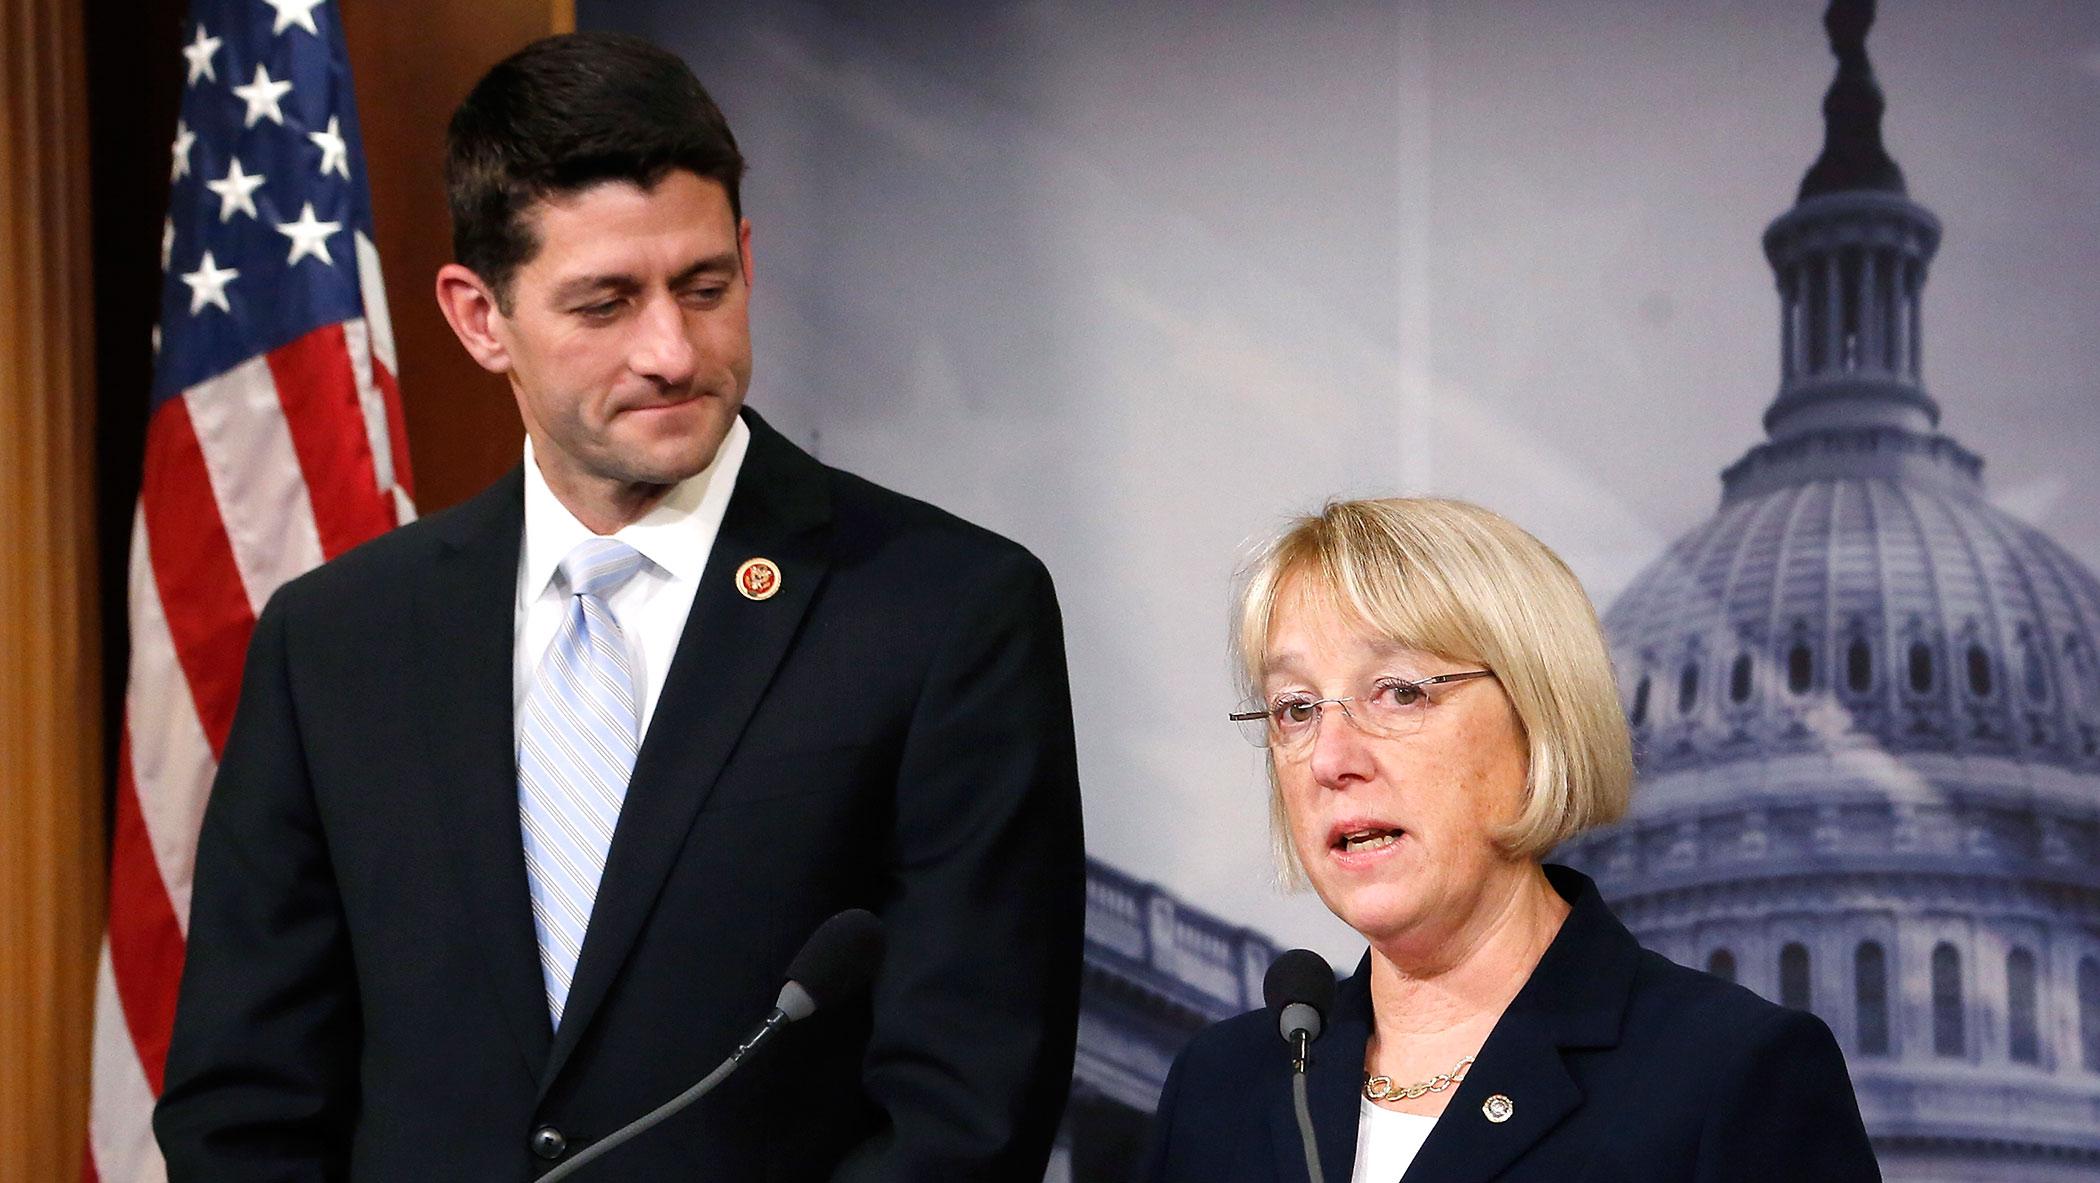 Paul Ryan and Patty Murray